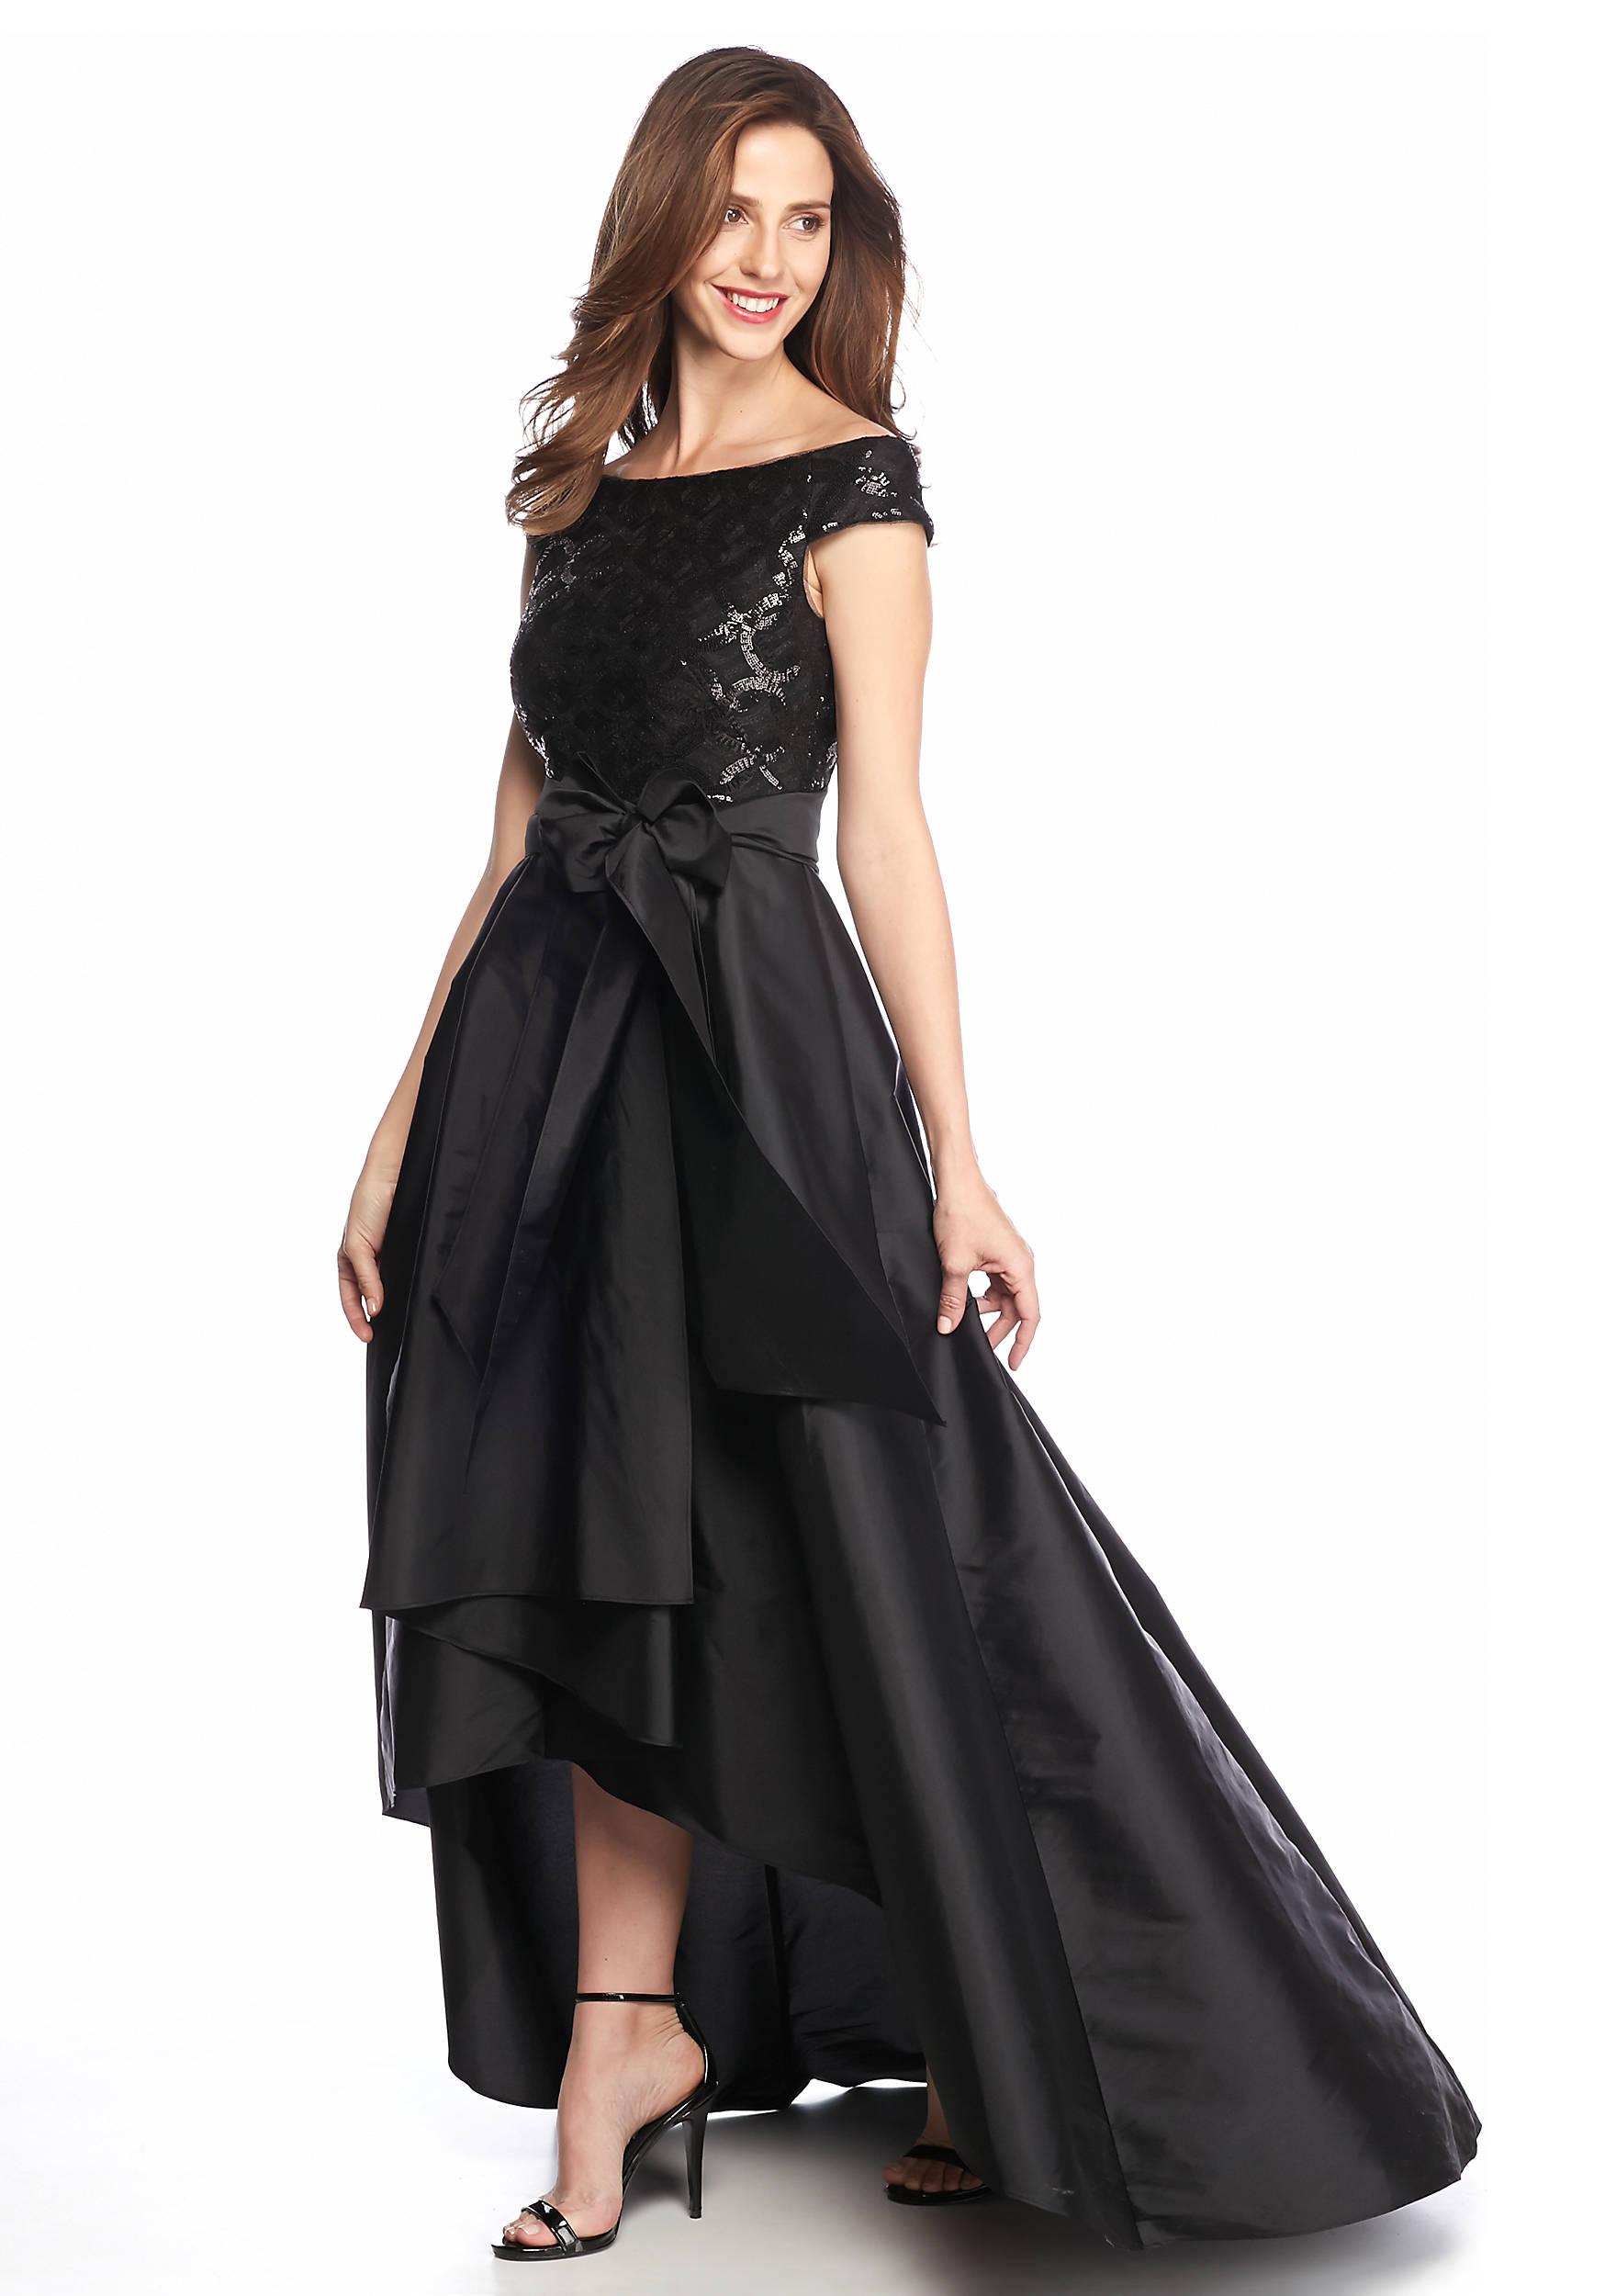 8a52d3eb358 Belk Junior Semi Formal Dresses - Gomes Weine AG